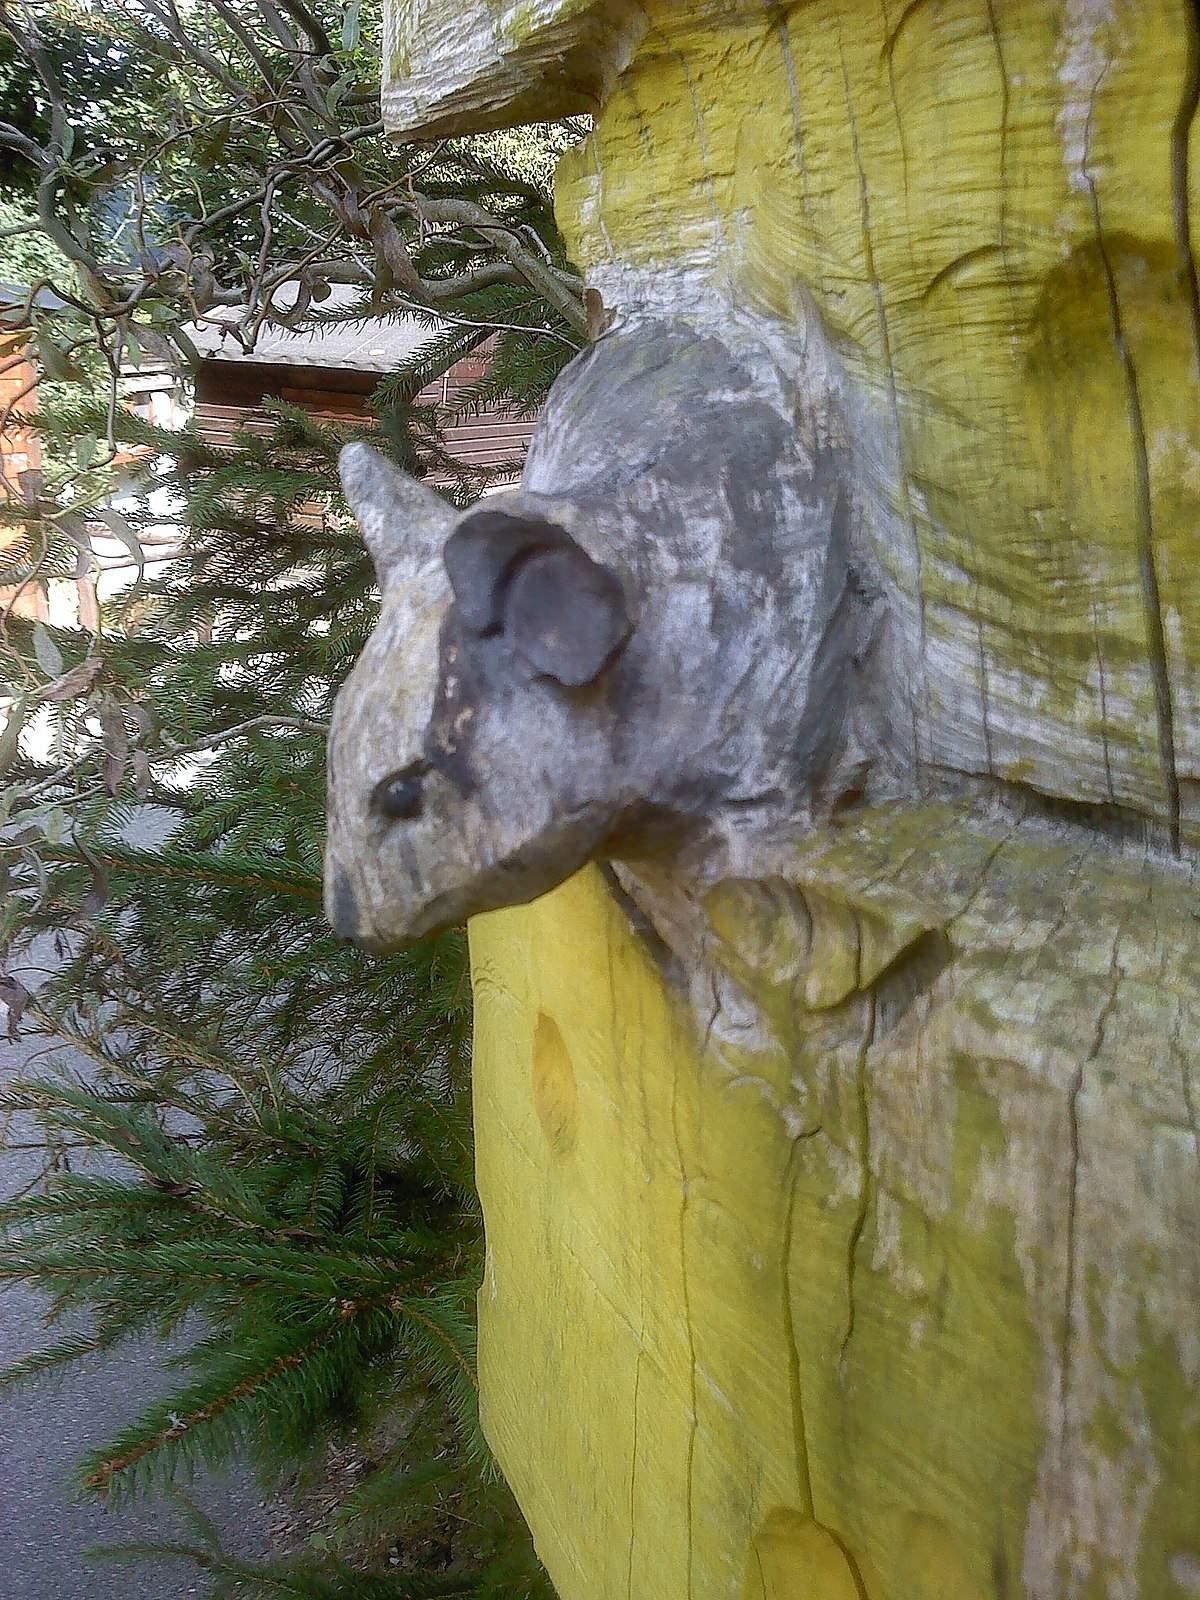 1200px Zoo der Minis aue 2012 09 08 ama fec 11